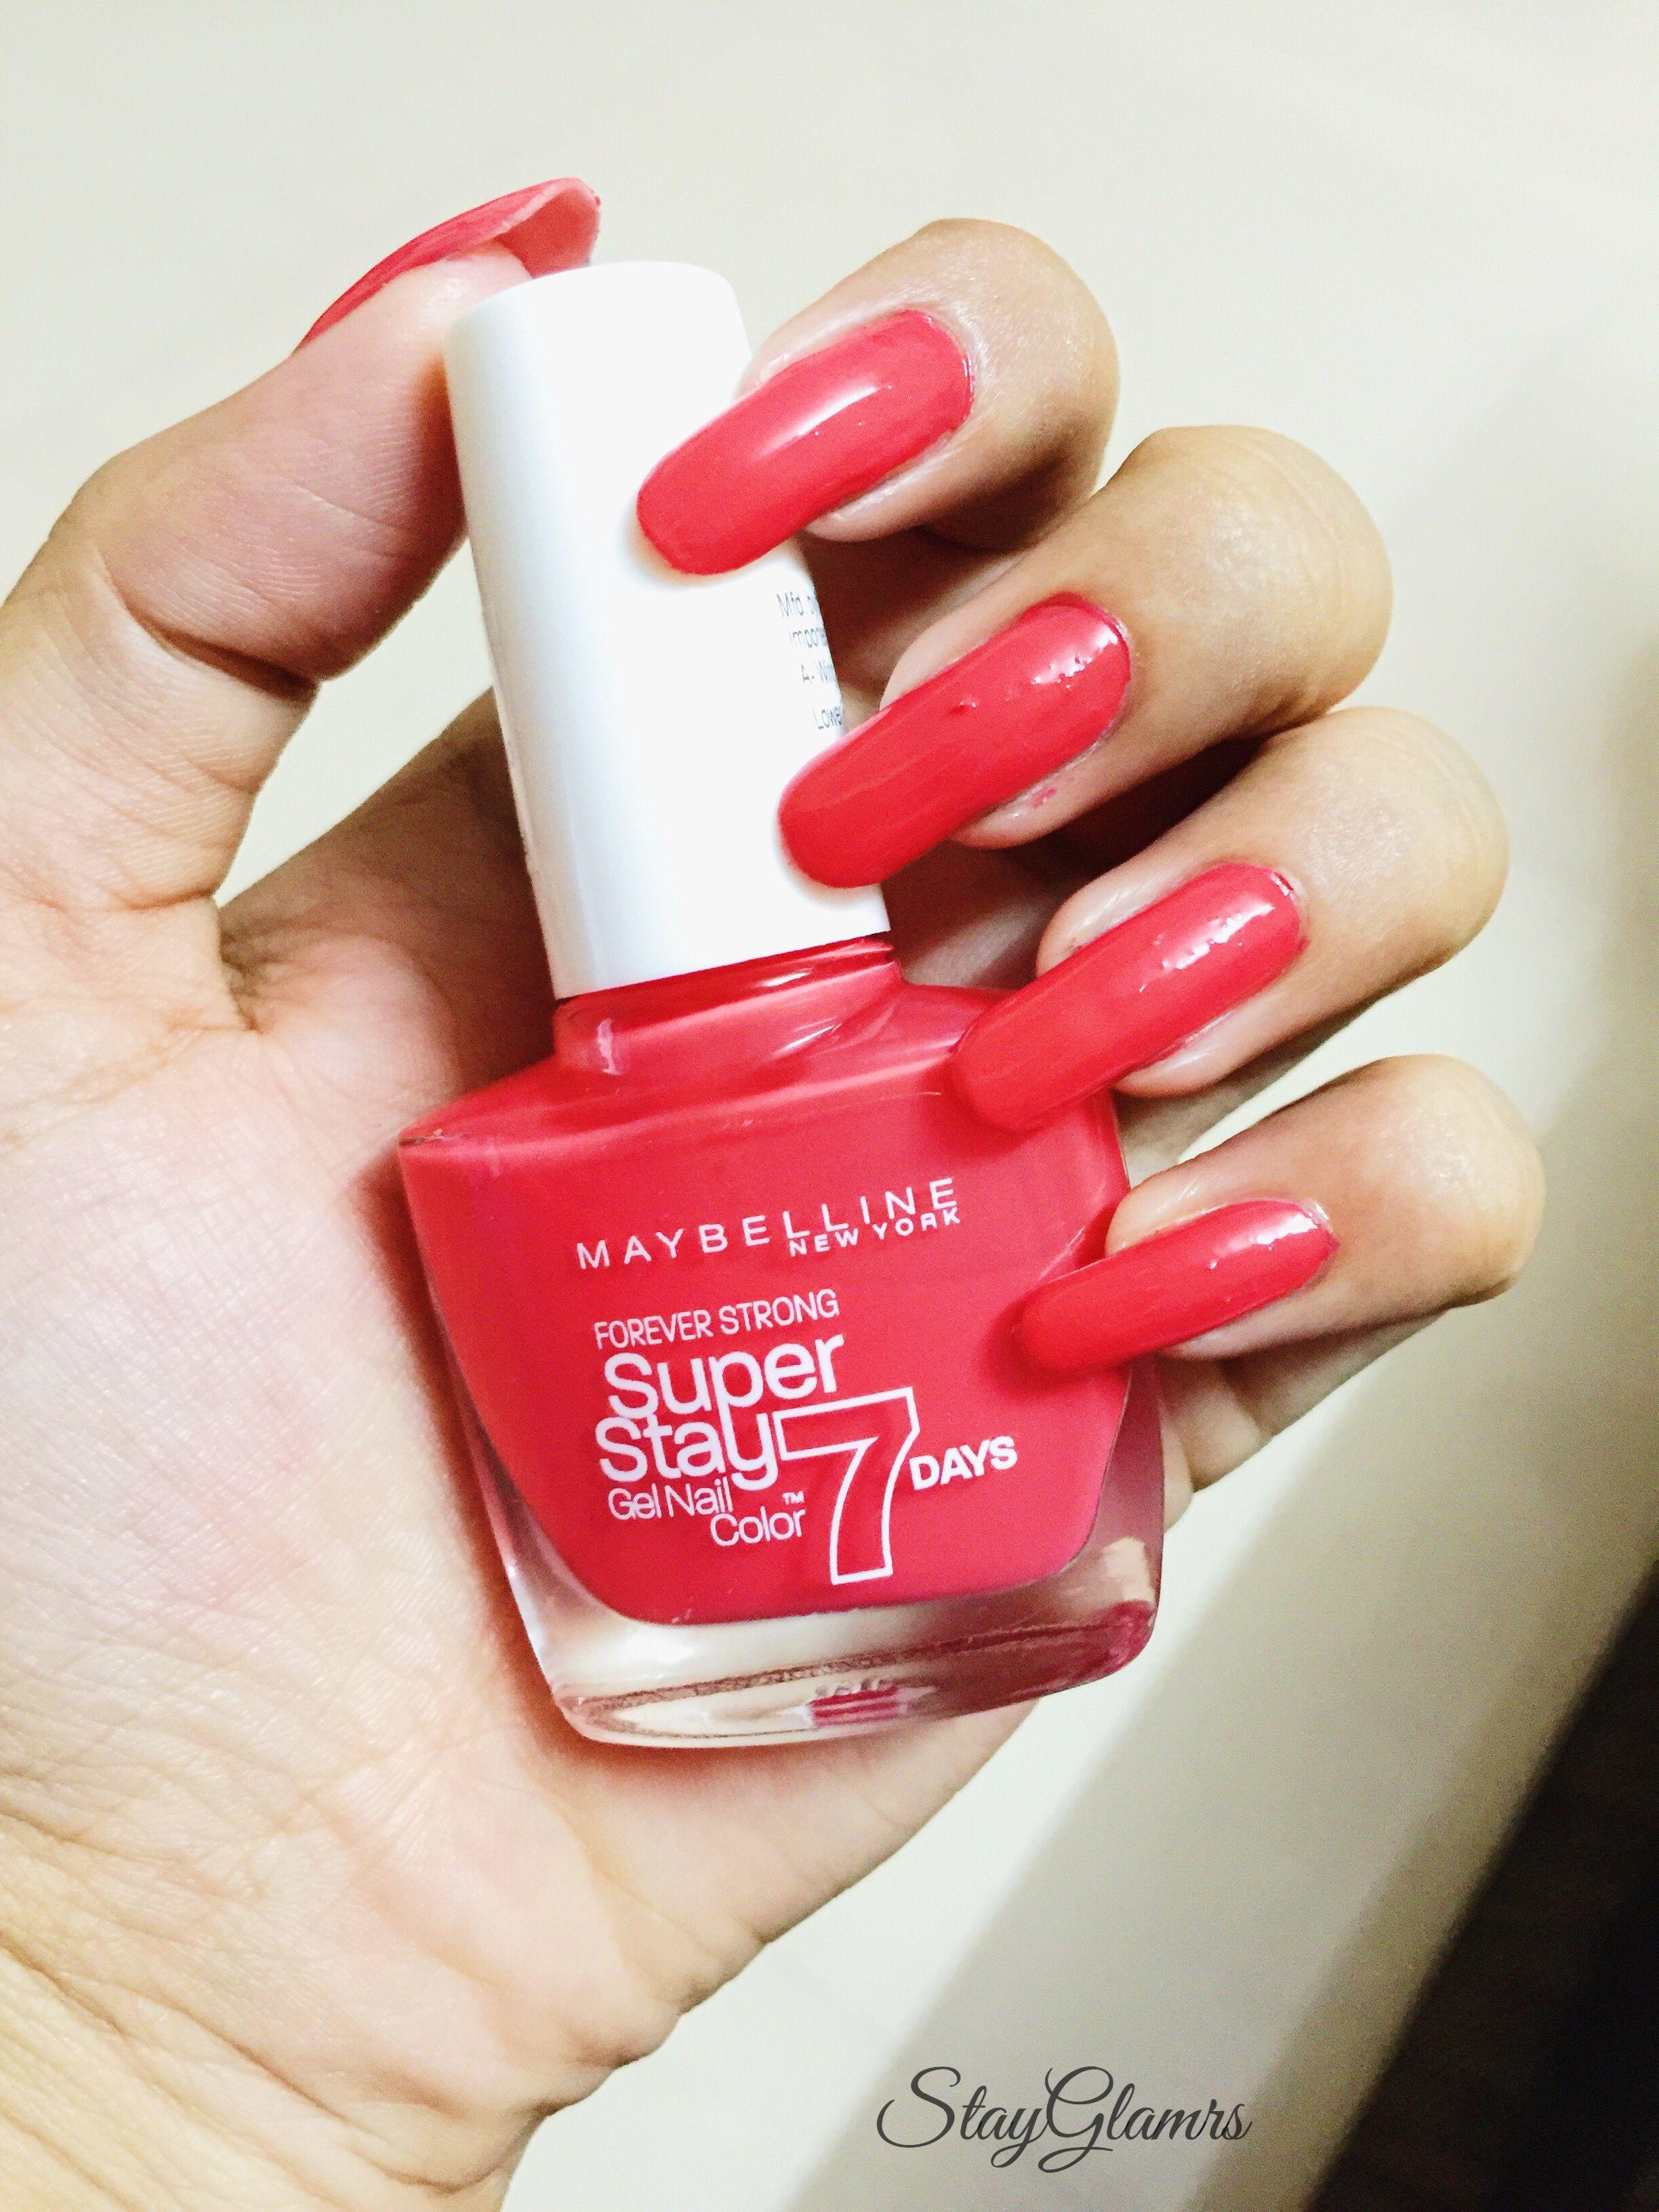 Maybelline Superstay 7 Days Gel Nail Color Rose Salsa Gel Nail Colors Gel Nails Nail Colors